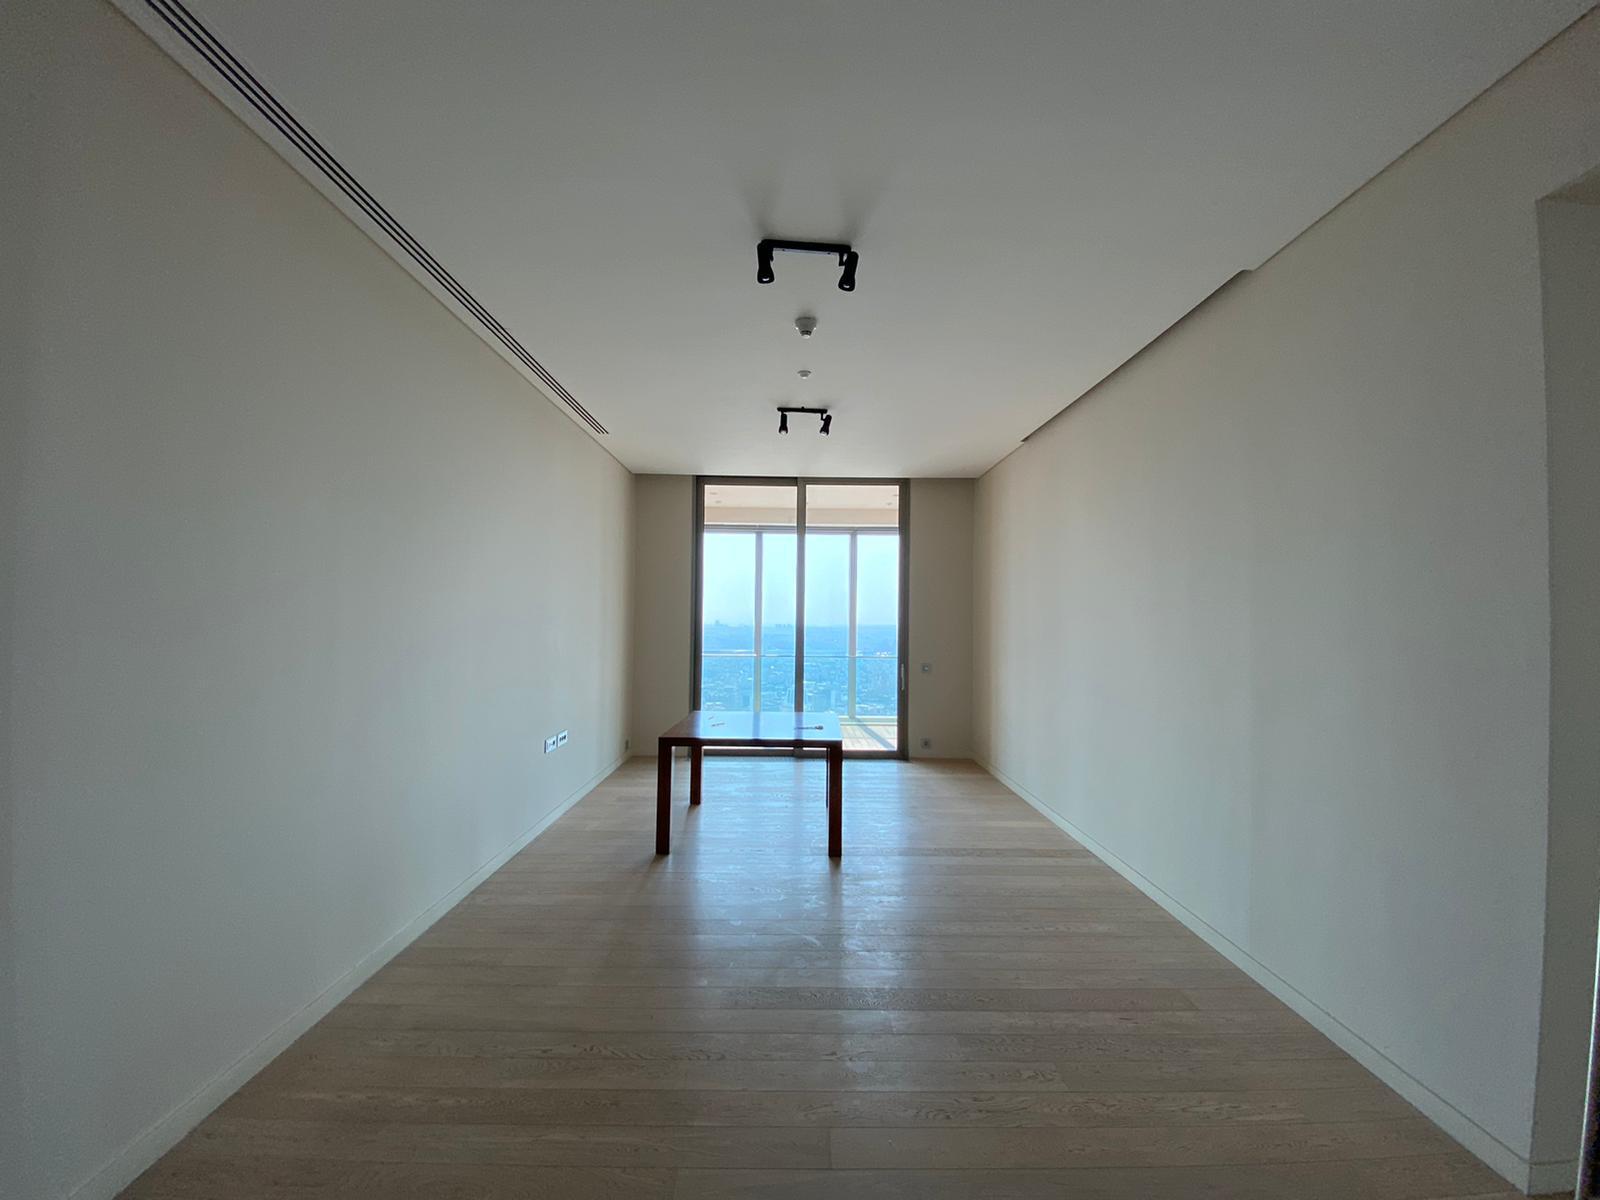 penthouse-istanbul-sapphire-tower-020-1.jpg